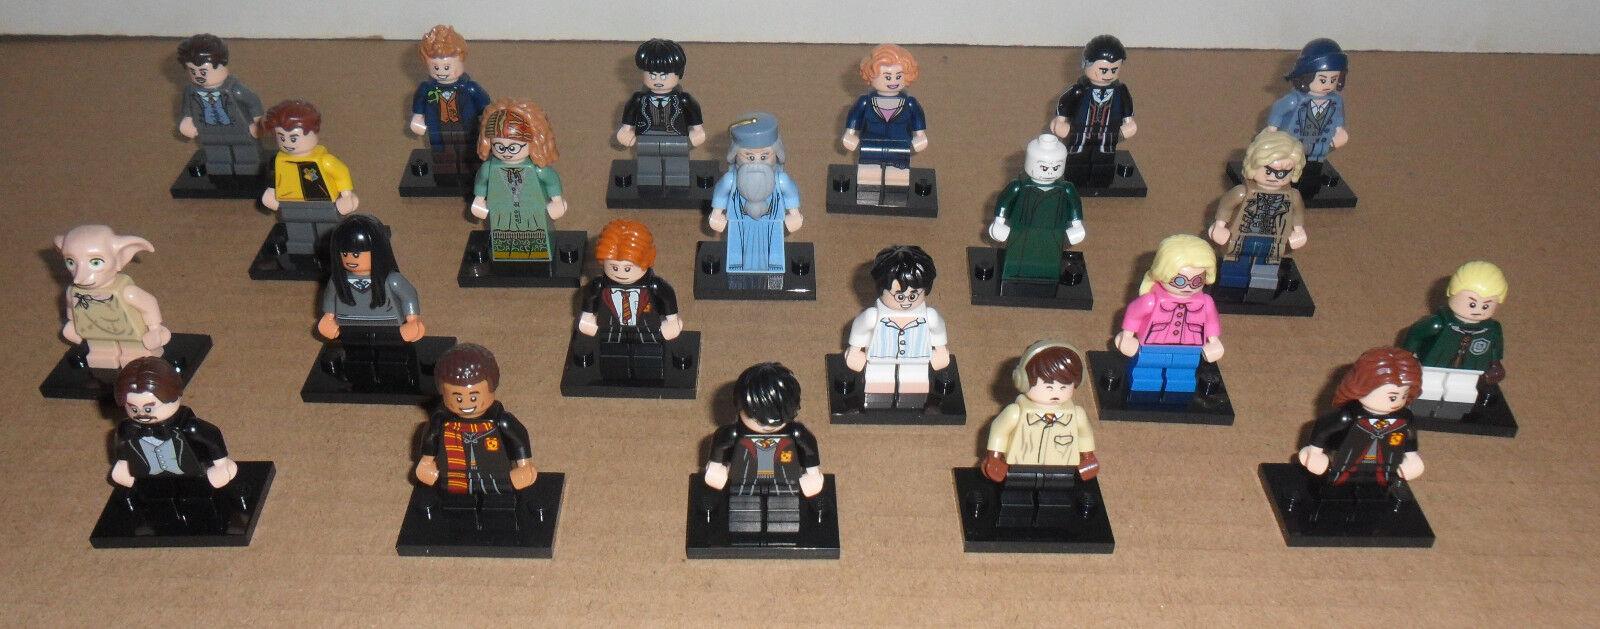 Lego Harry Potter  Fantastic Beasts Minifigures  complete set of 22